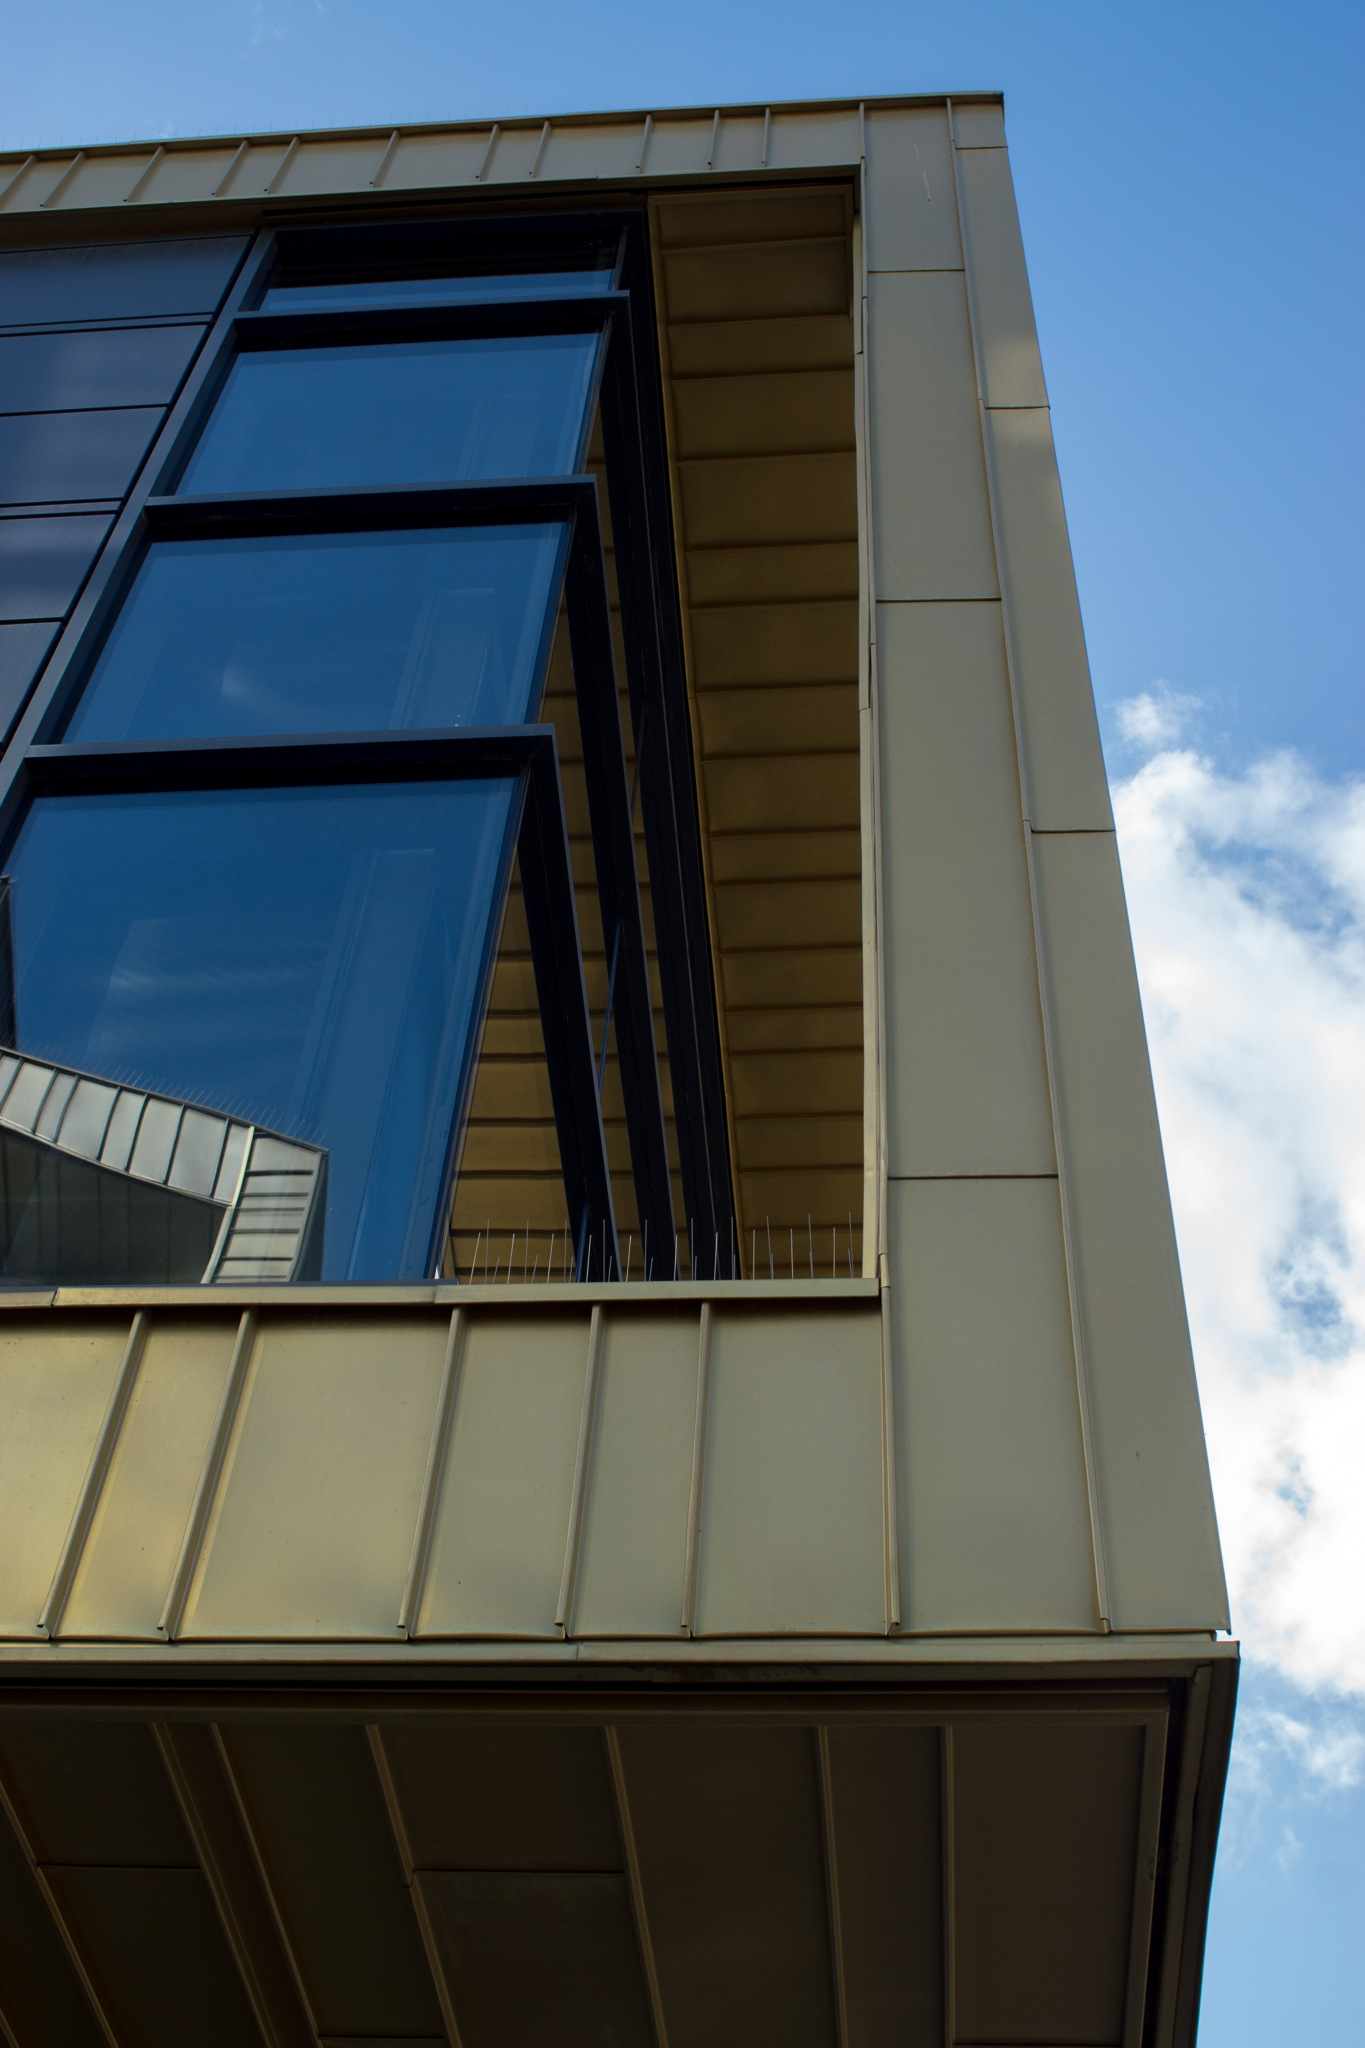 Keynsham Civic Centre 2 by PixAl Photography